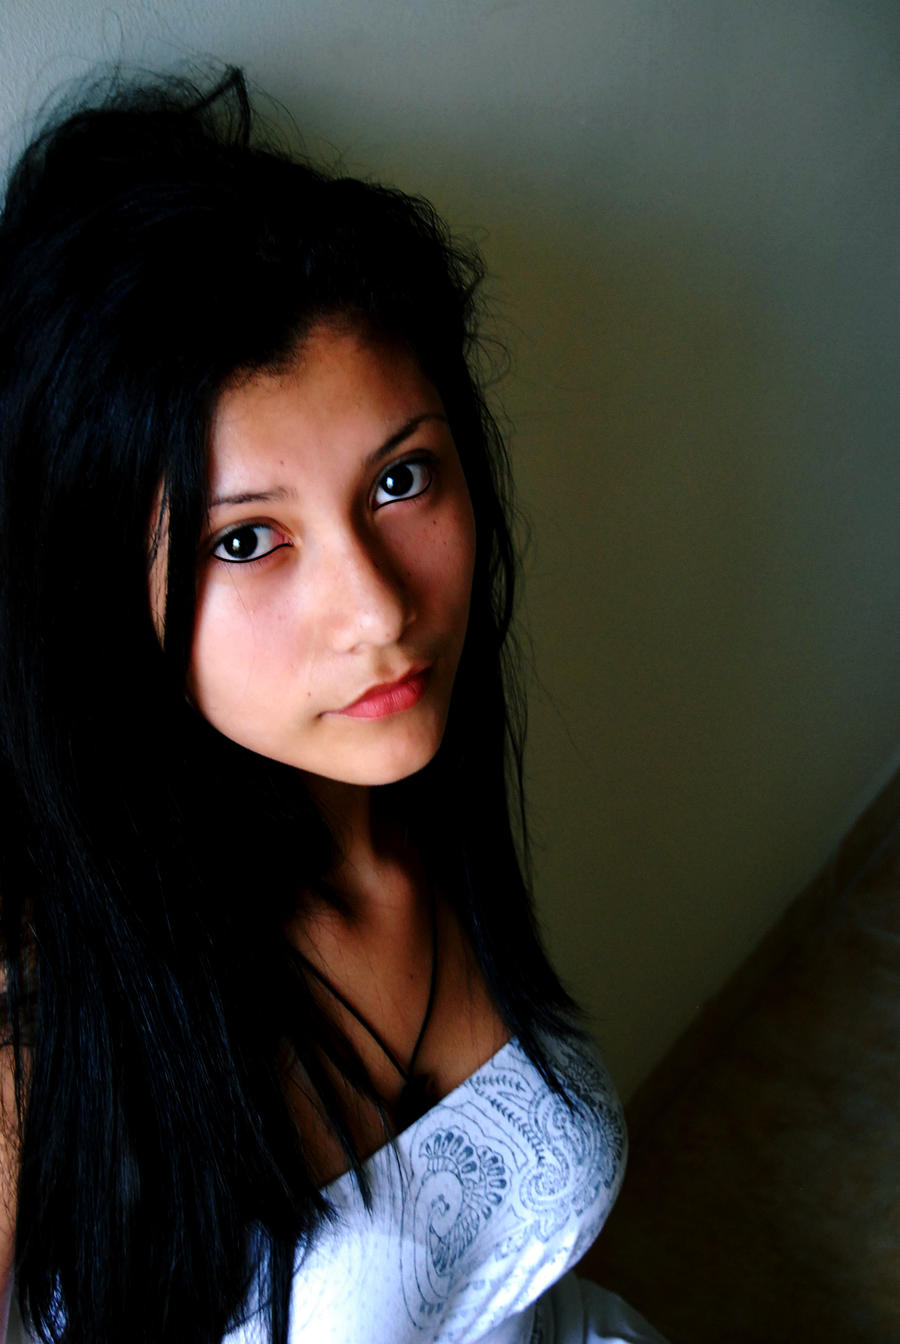 Latina model - looking indise you by n3crofago